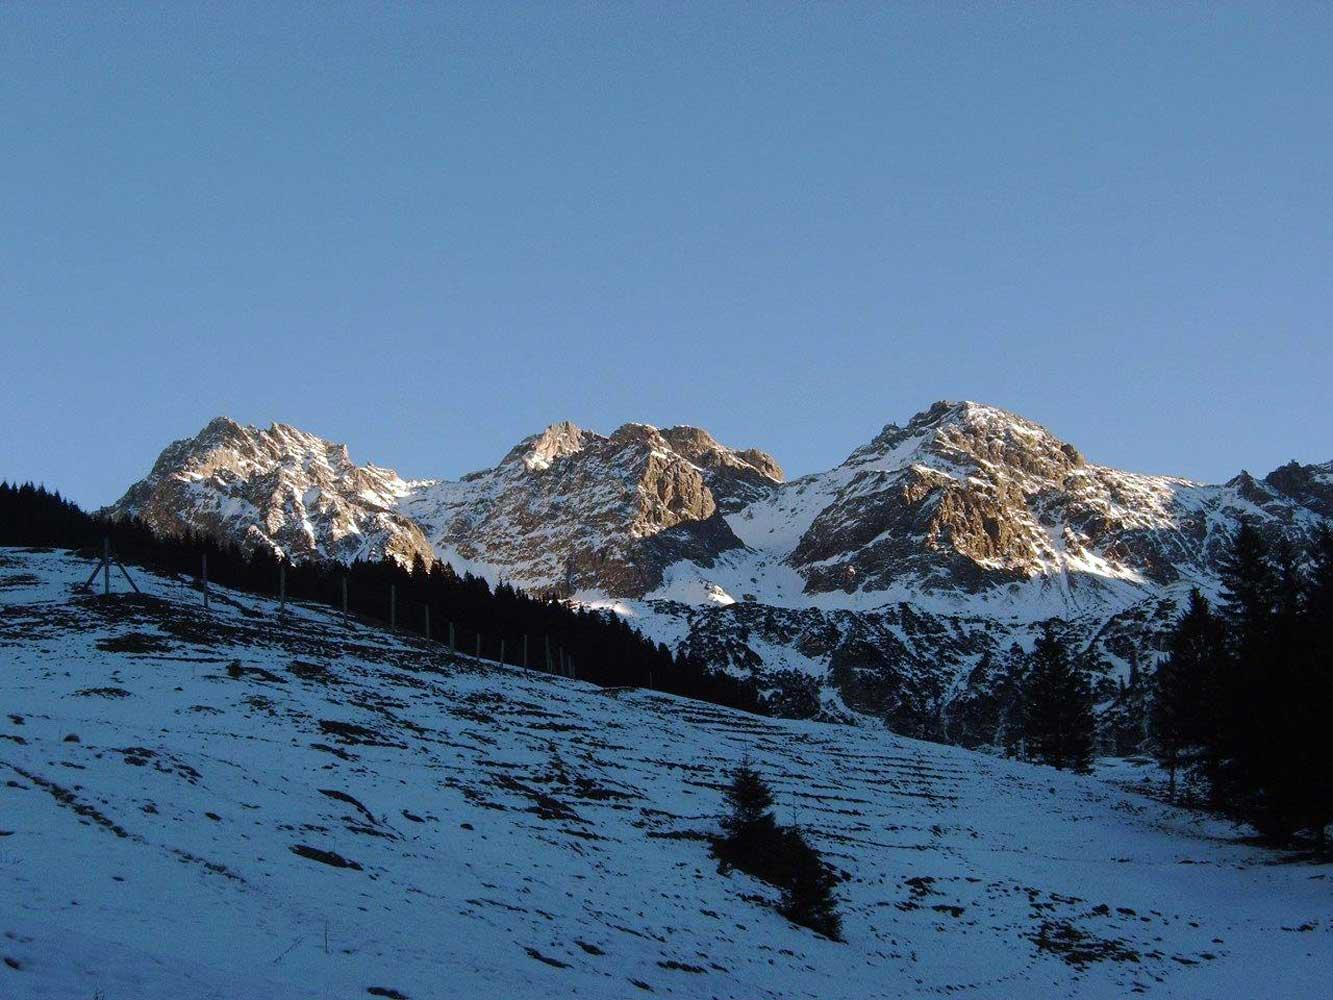 Innere Wiesalpe Kleinwalsertal, Ausflugsziel, Alpe, Brotzeit – tolle Bergsicht